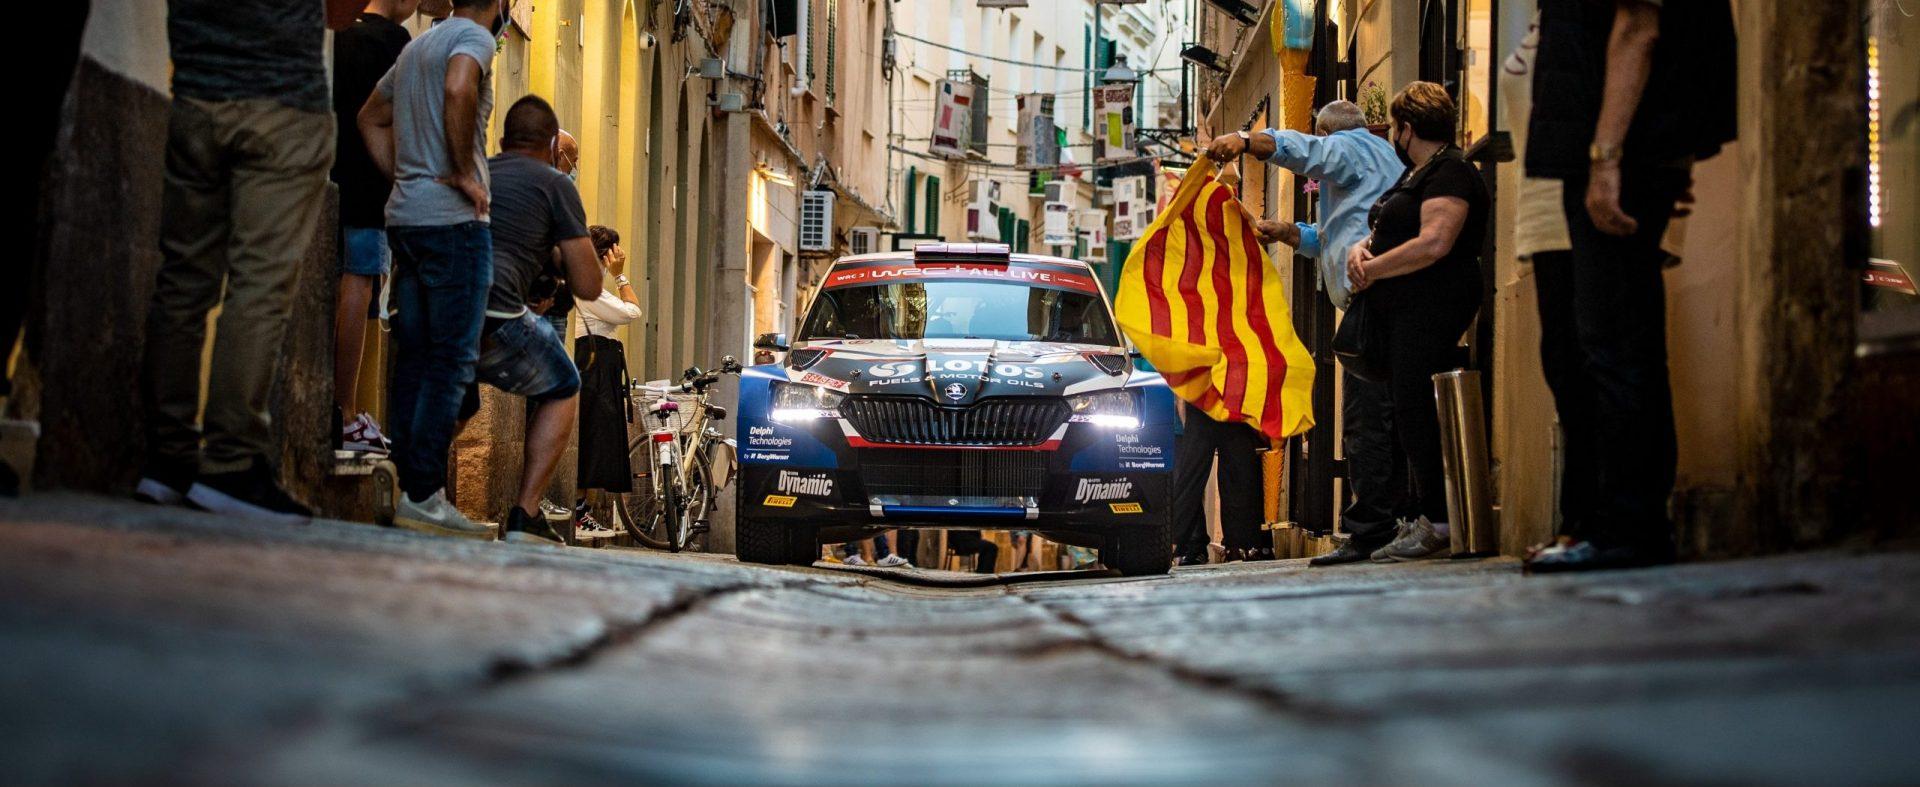 Download Rallye Italia Sardegna Wallpapers for Your Phone